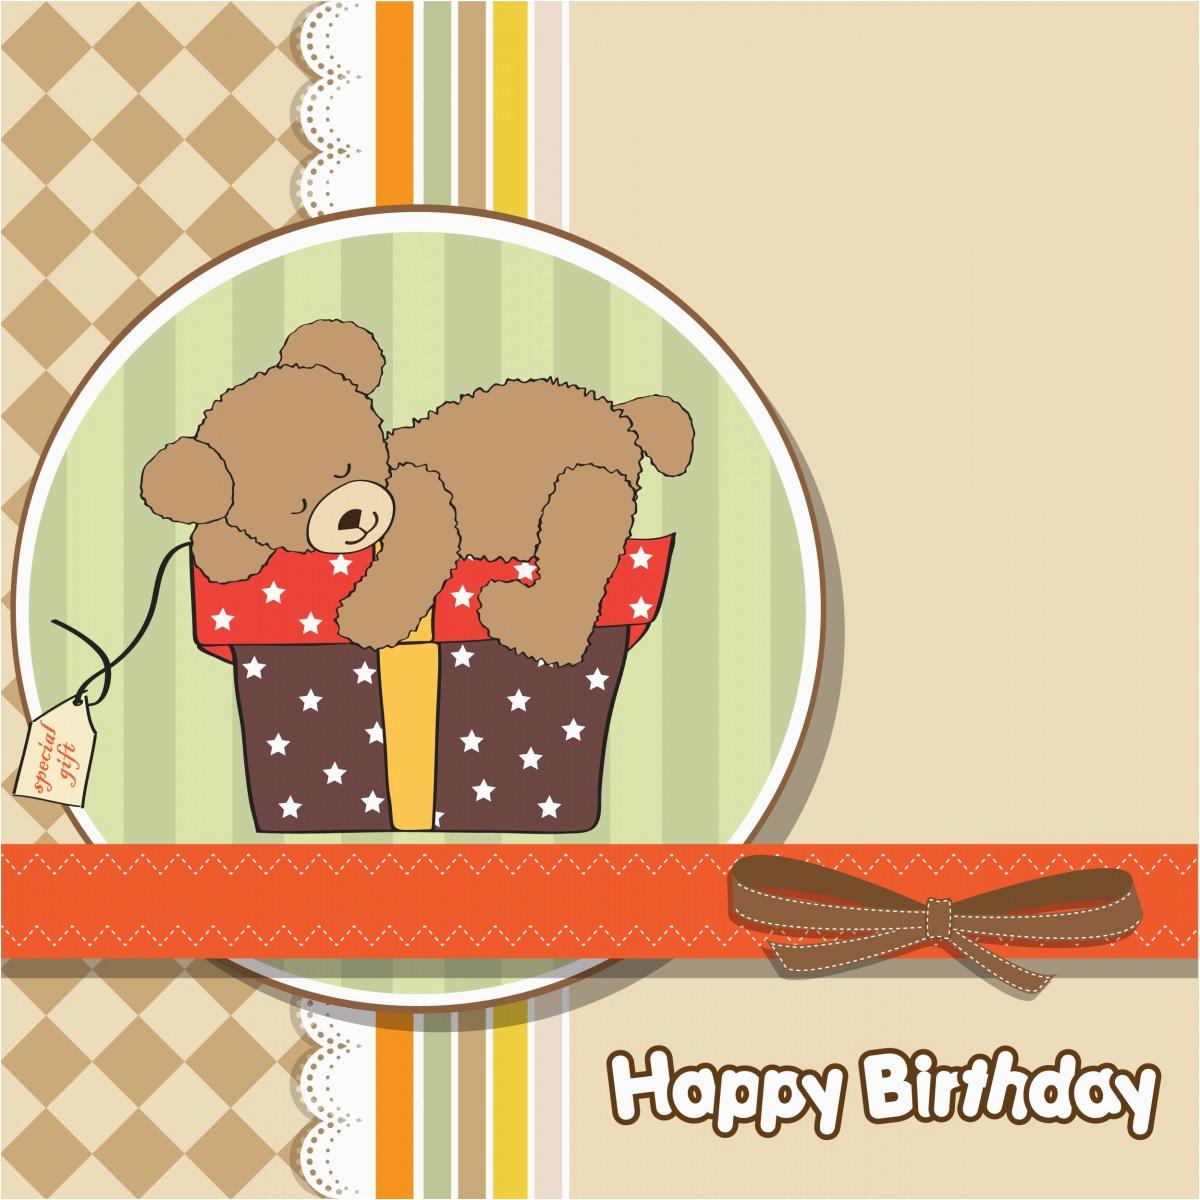 34 interesting free birthday cards funny animated mavraievie